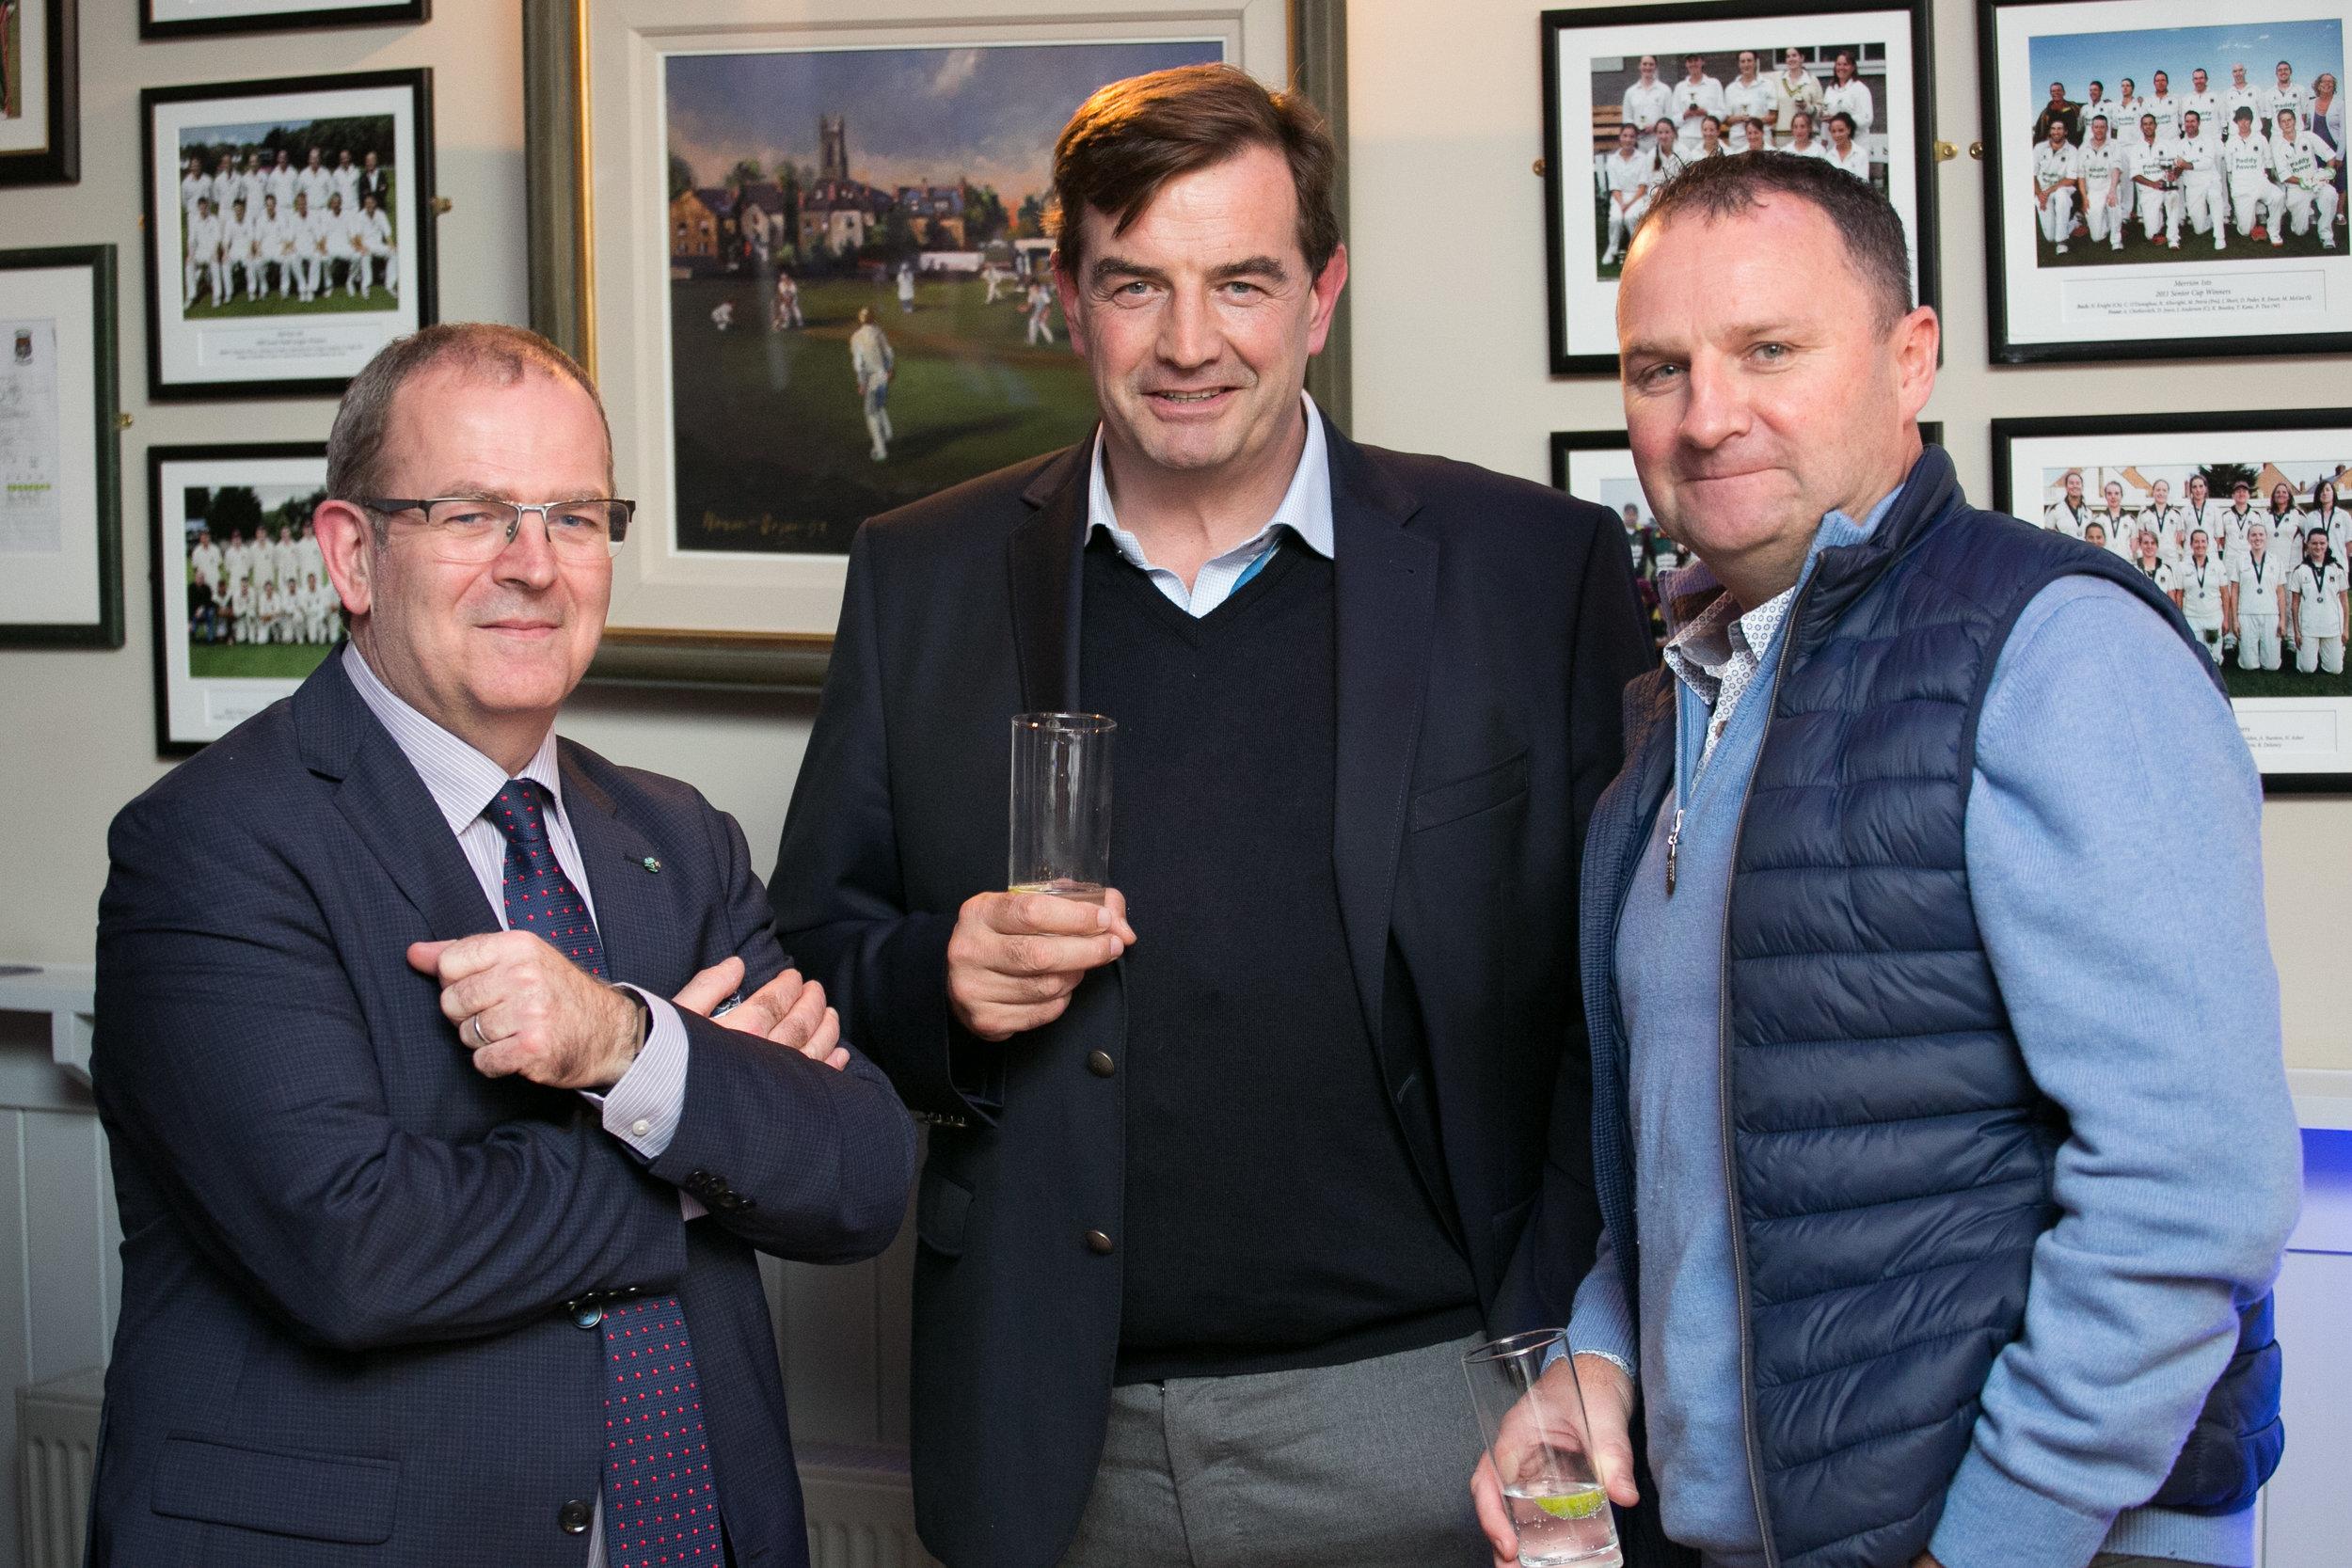 PAddy Byrne Ballsbridge Living David Madigan Horseshow House and Niall Lawless Paddy Cullen's-34.jpg